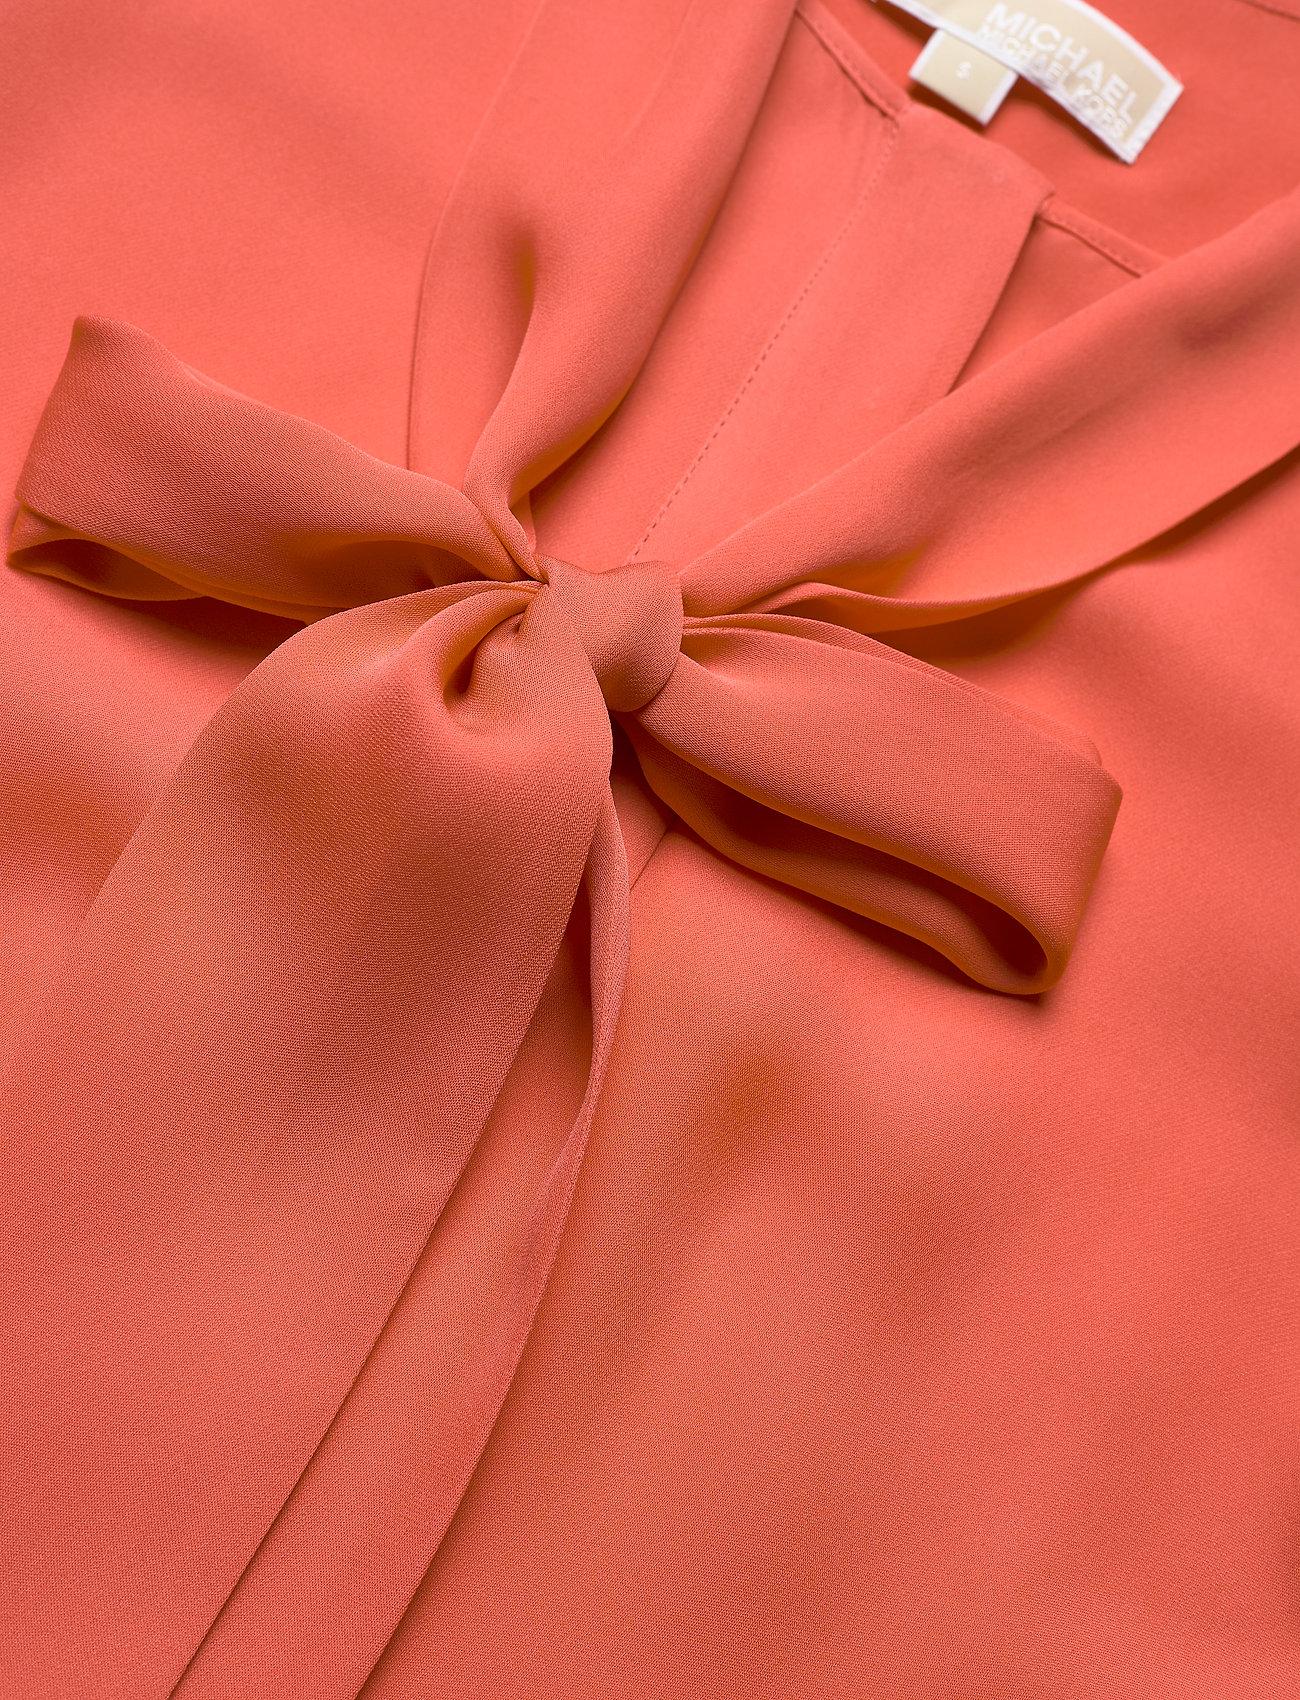 Solid Silk Bow Blse (Coral Peach) (168.75 €) - Michael Kors 8dUf0